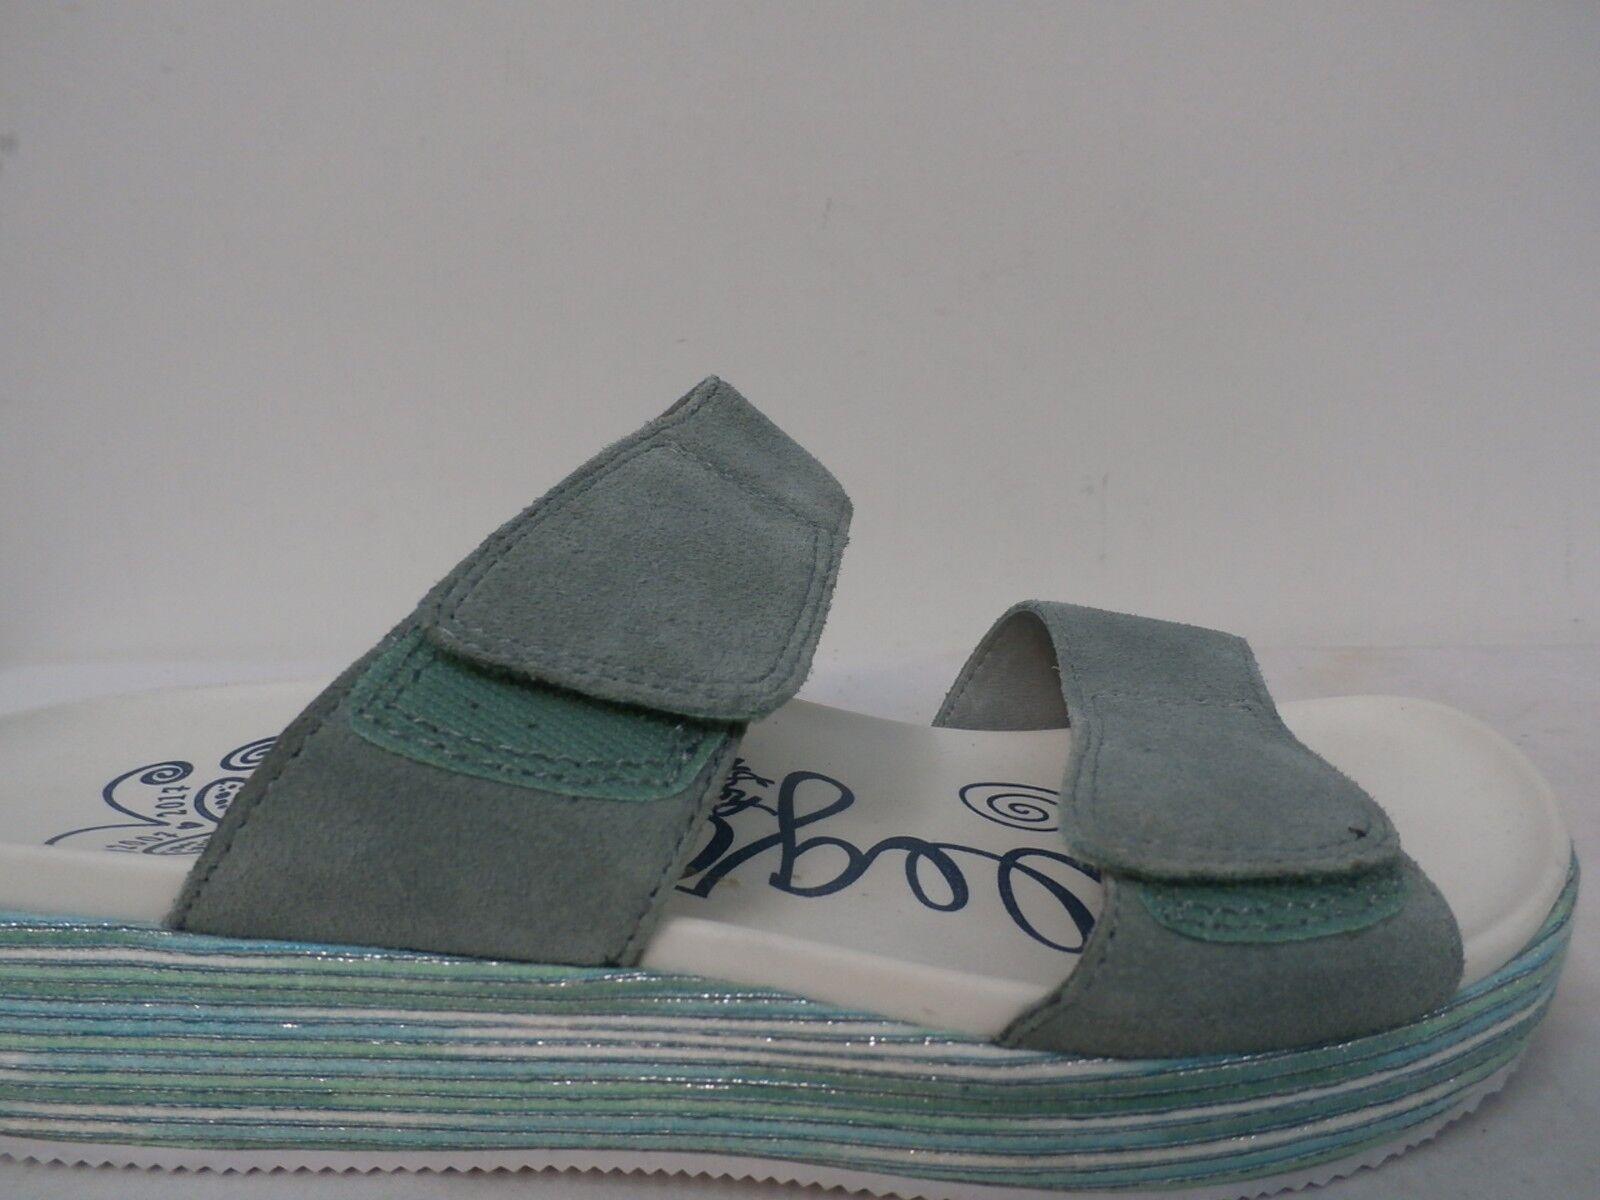 Alegria Suede Adjustable Slide Wedge Sandals Sandals Sandals - Mixie blueE HARBOR Size 38(8-8.5) 04237e